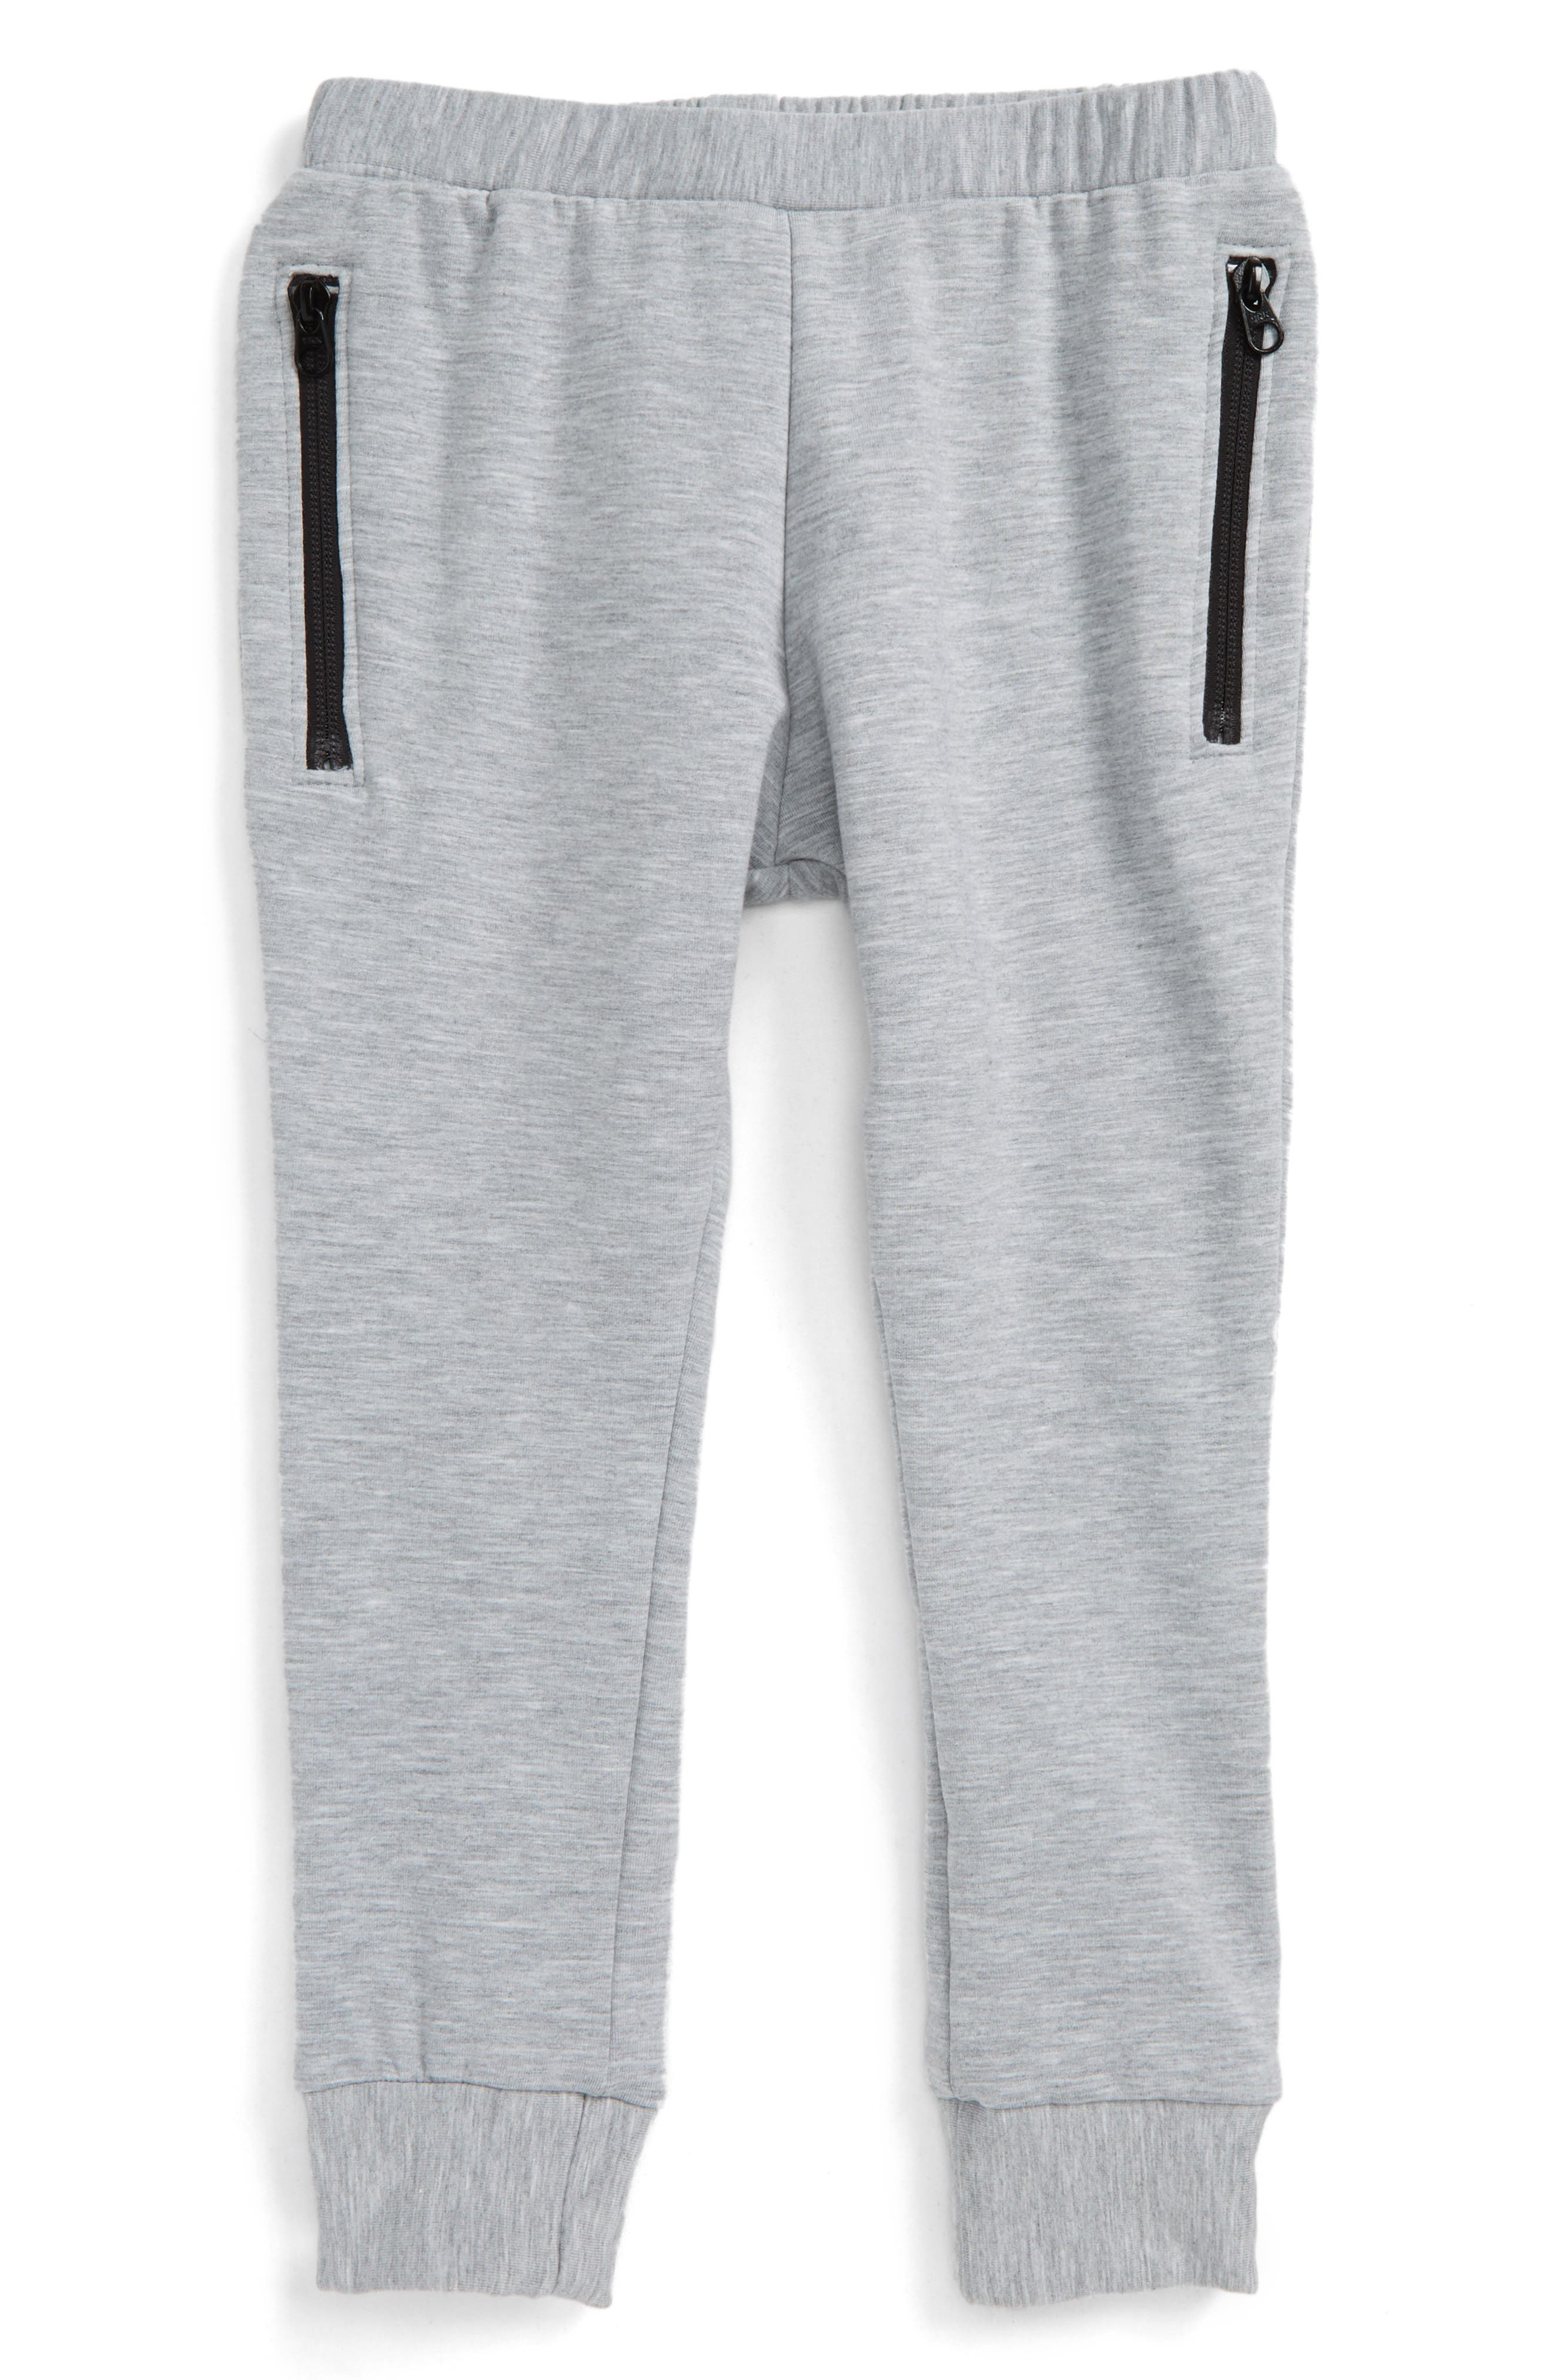 Philips Sweatpants,                         Main,                         color, Grey